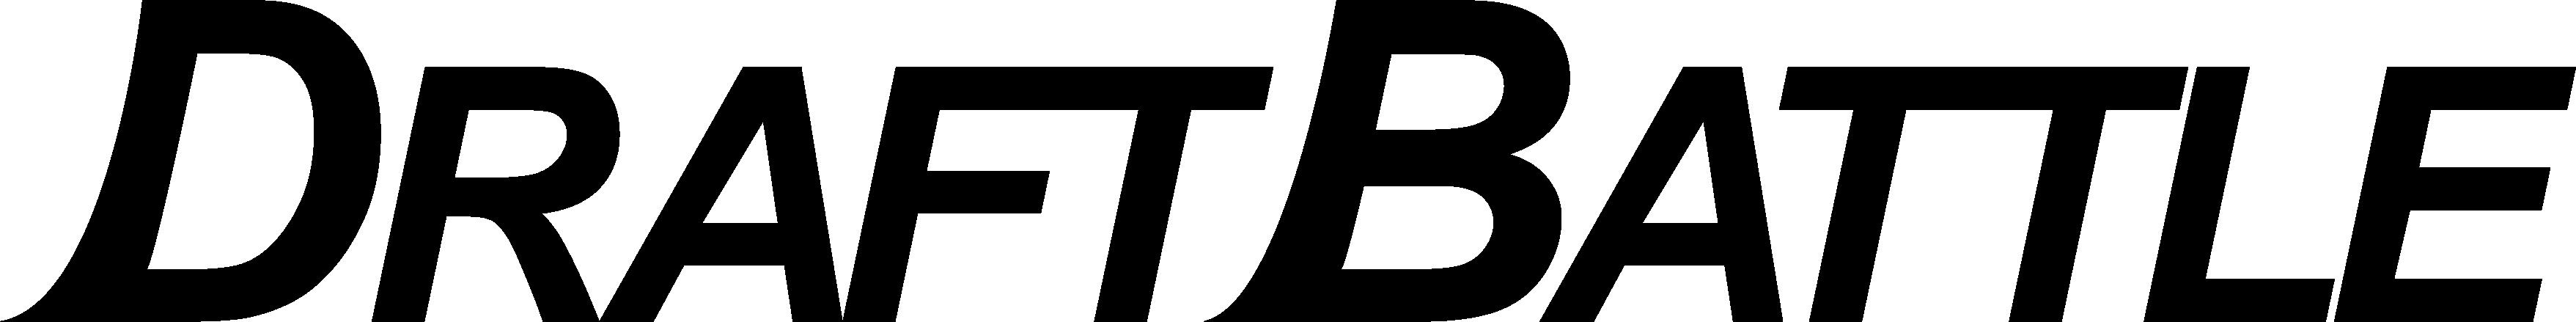 draftbattle